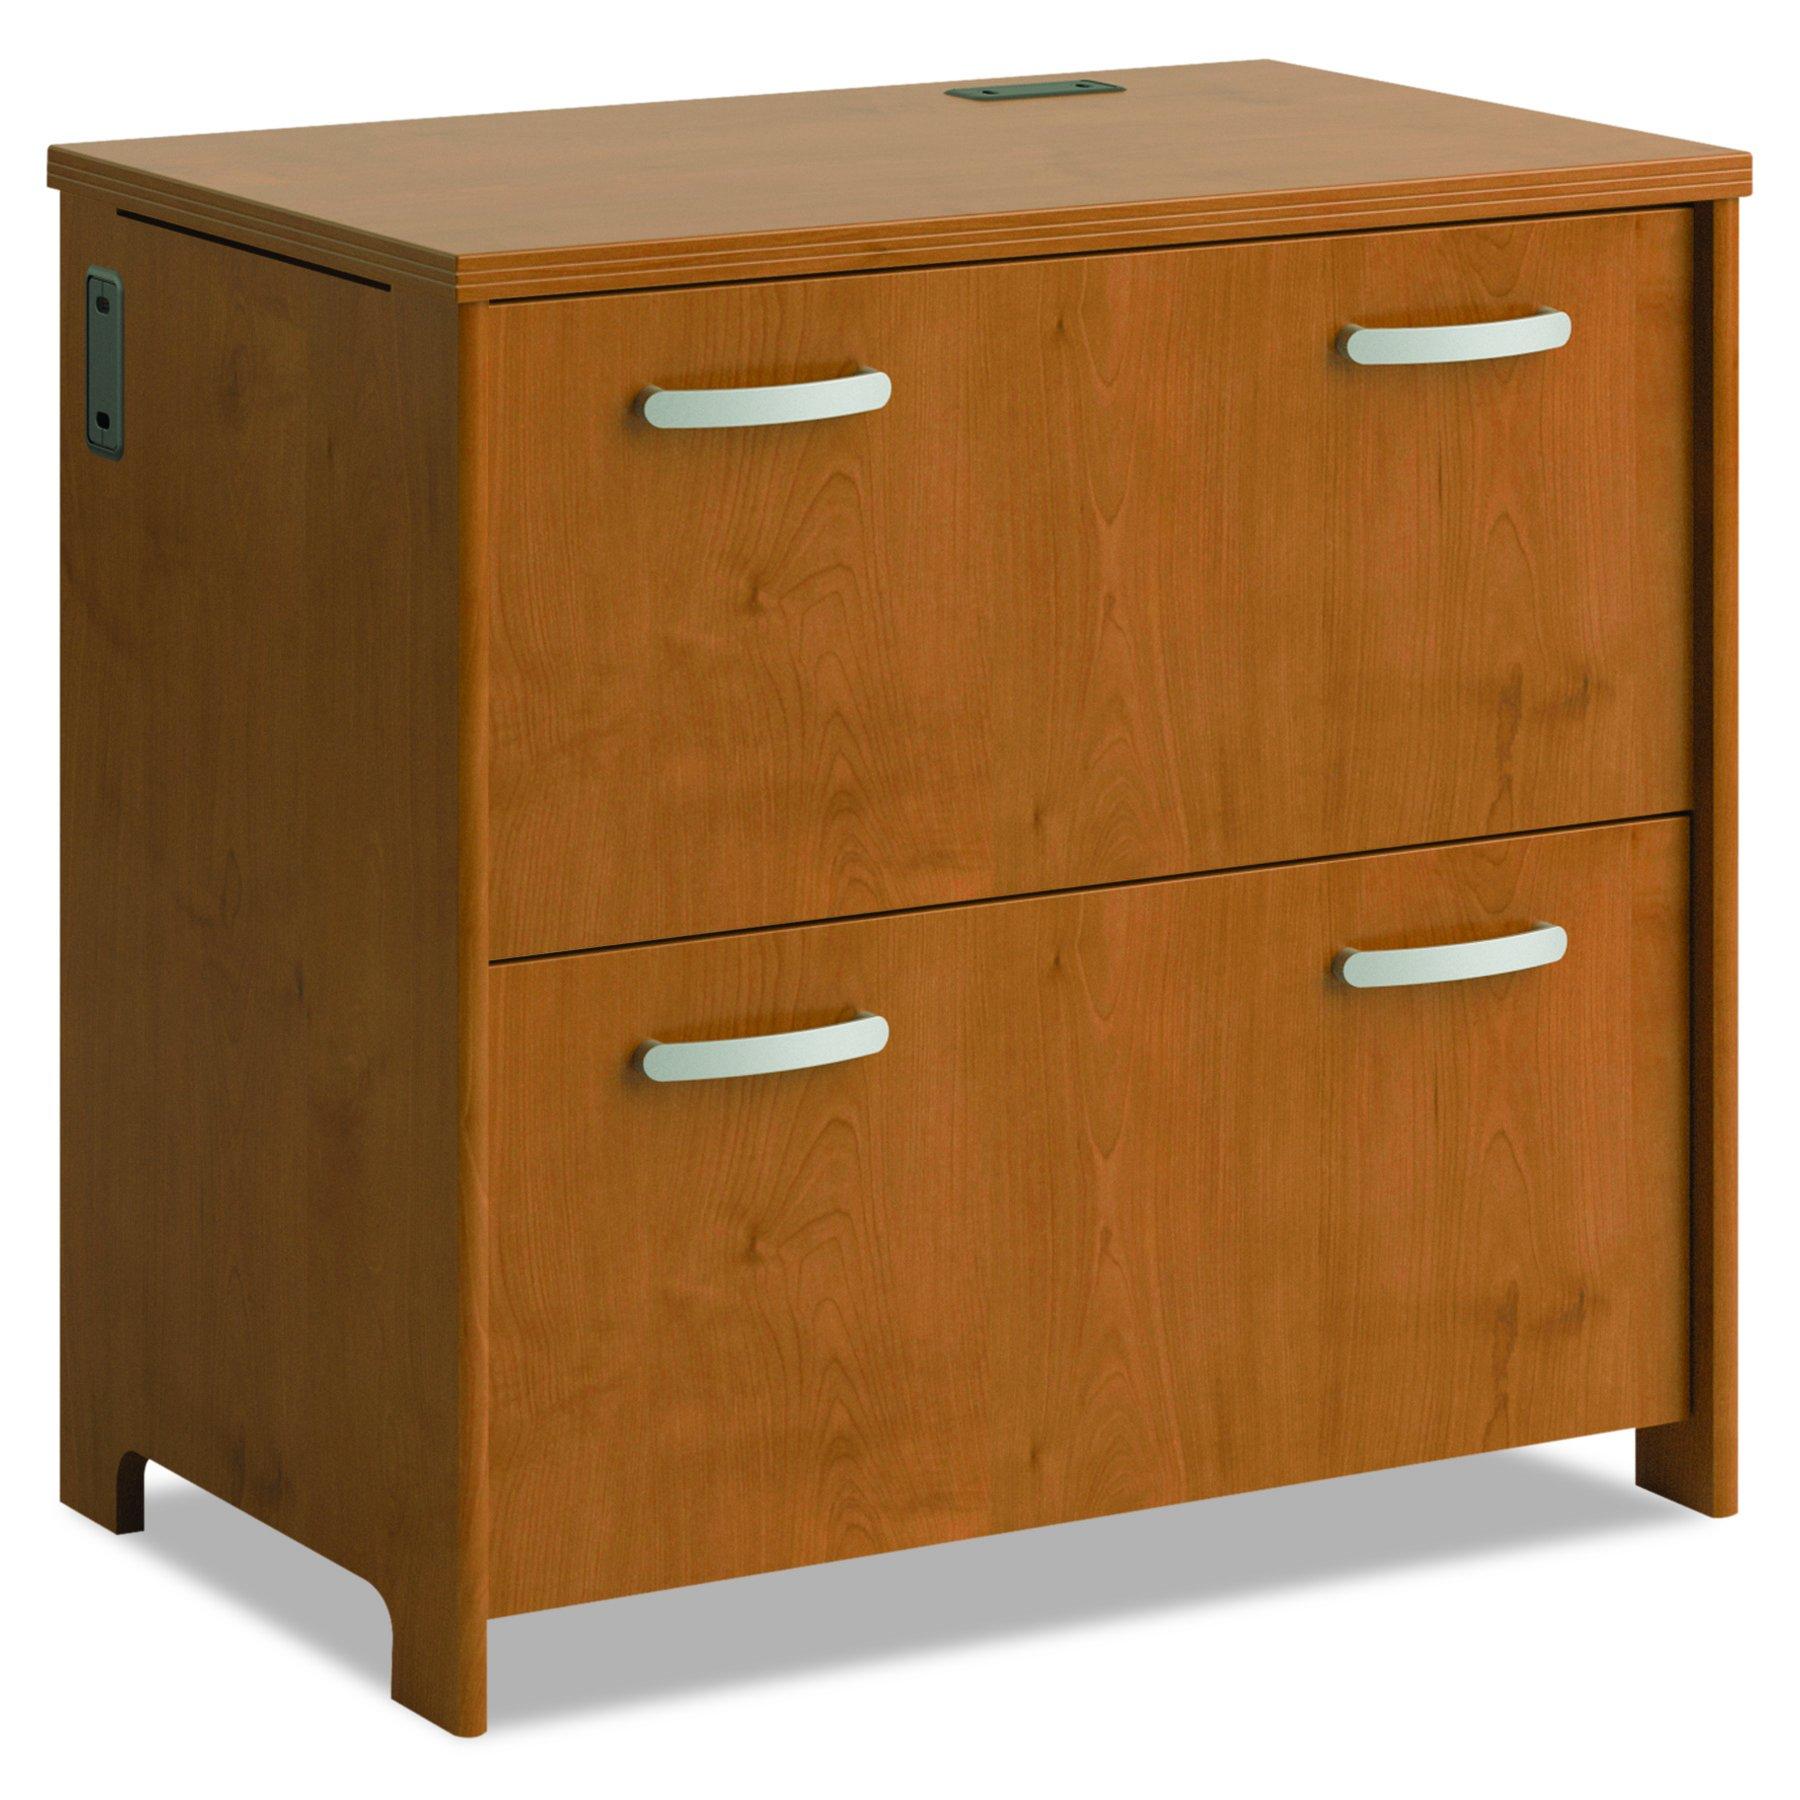 Bush Furniture PR76354 2-Drawer File, Natural Cherry by Bush Furniture (Image #1)